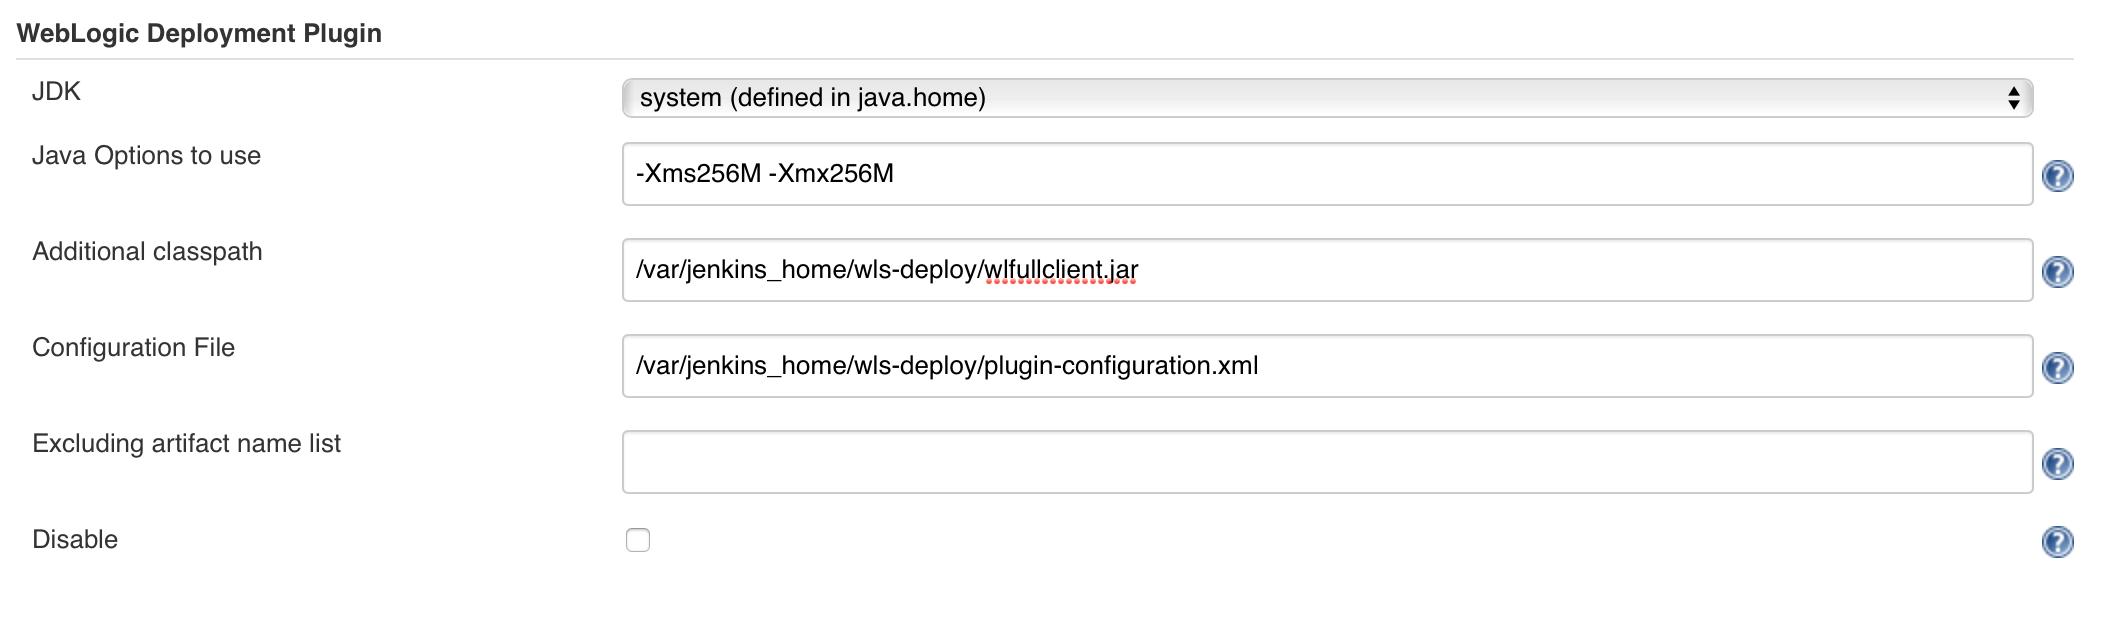 JENKINS-38205] Failed to deploy war on Weblogic: task